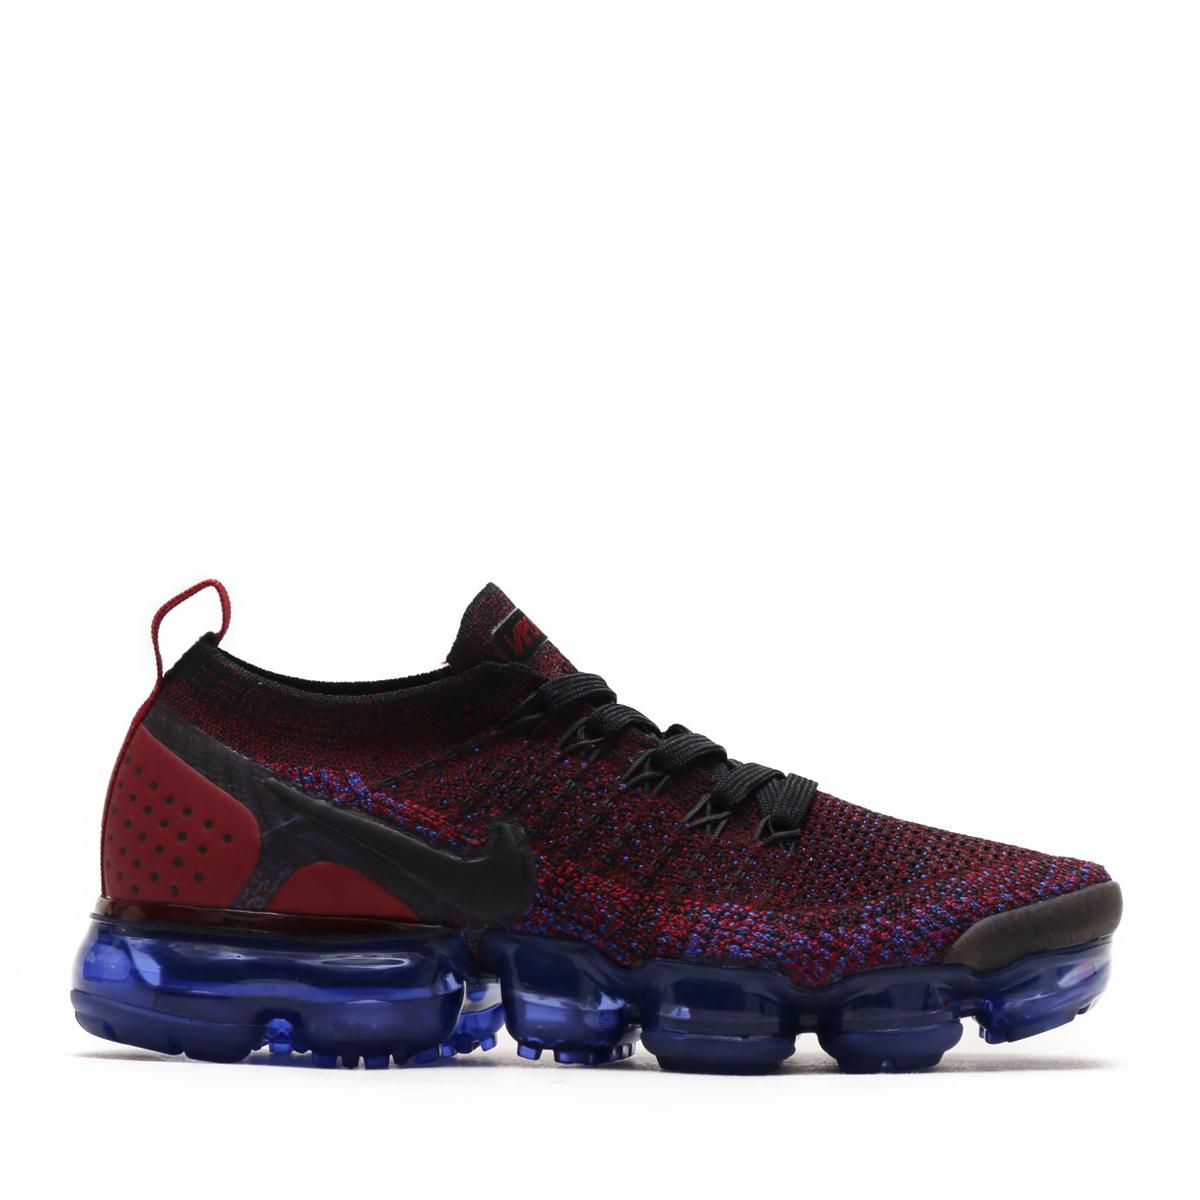 0361ab313642 NIKE WMNS AIR VAPORMAX FLYKNIT 2 (Nike women air vapor max fried food knit 2)  (BLACK BLACK-TEAM RED-RACER BLUE) 18SU-S